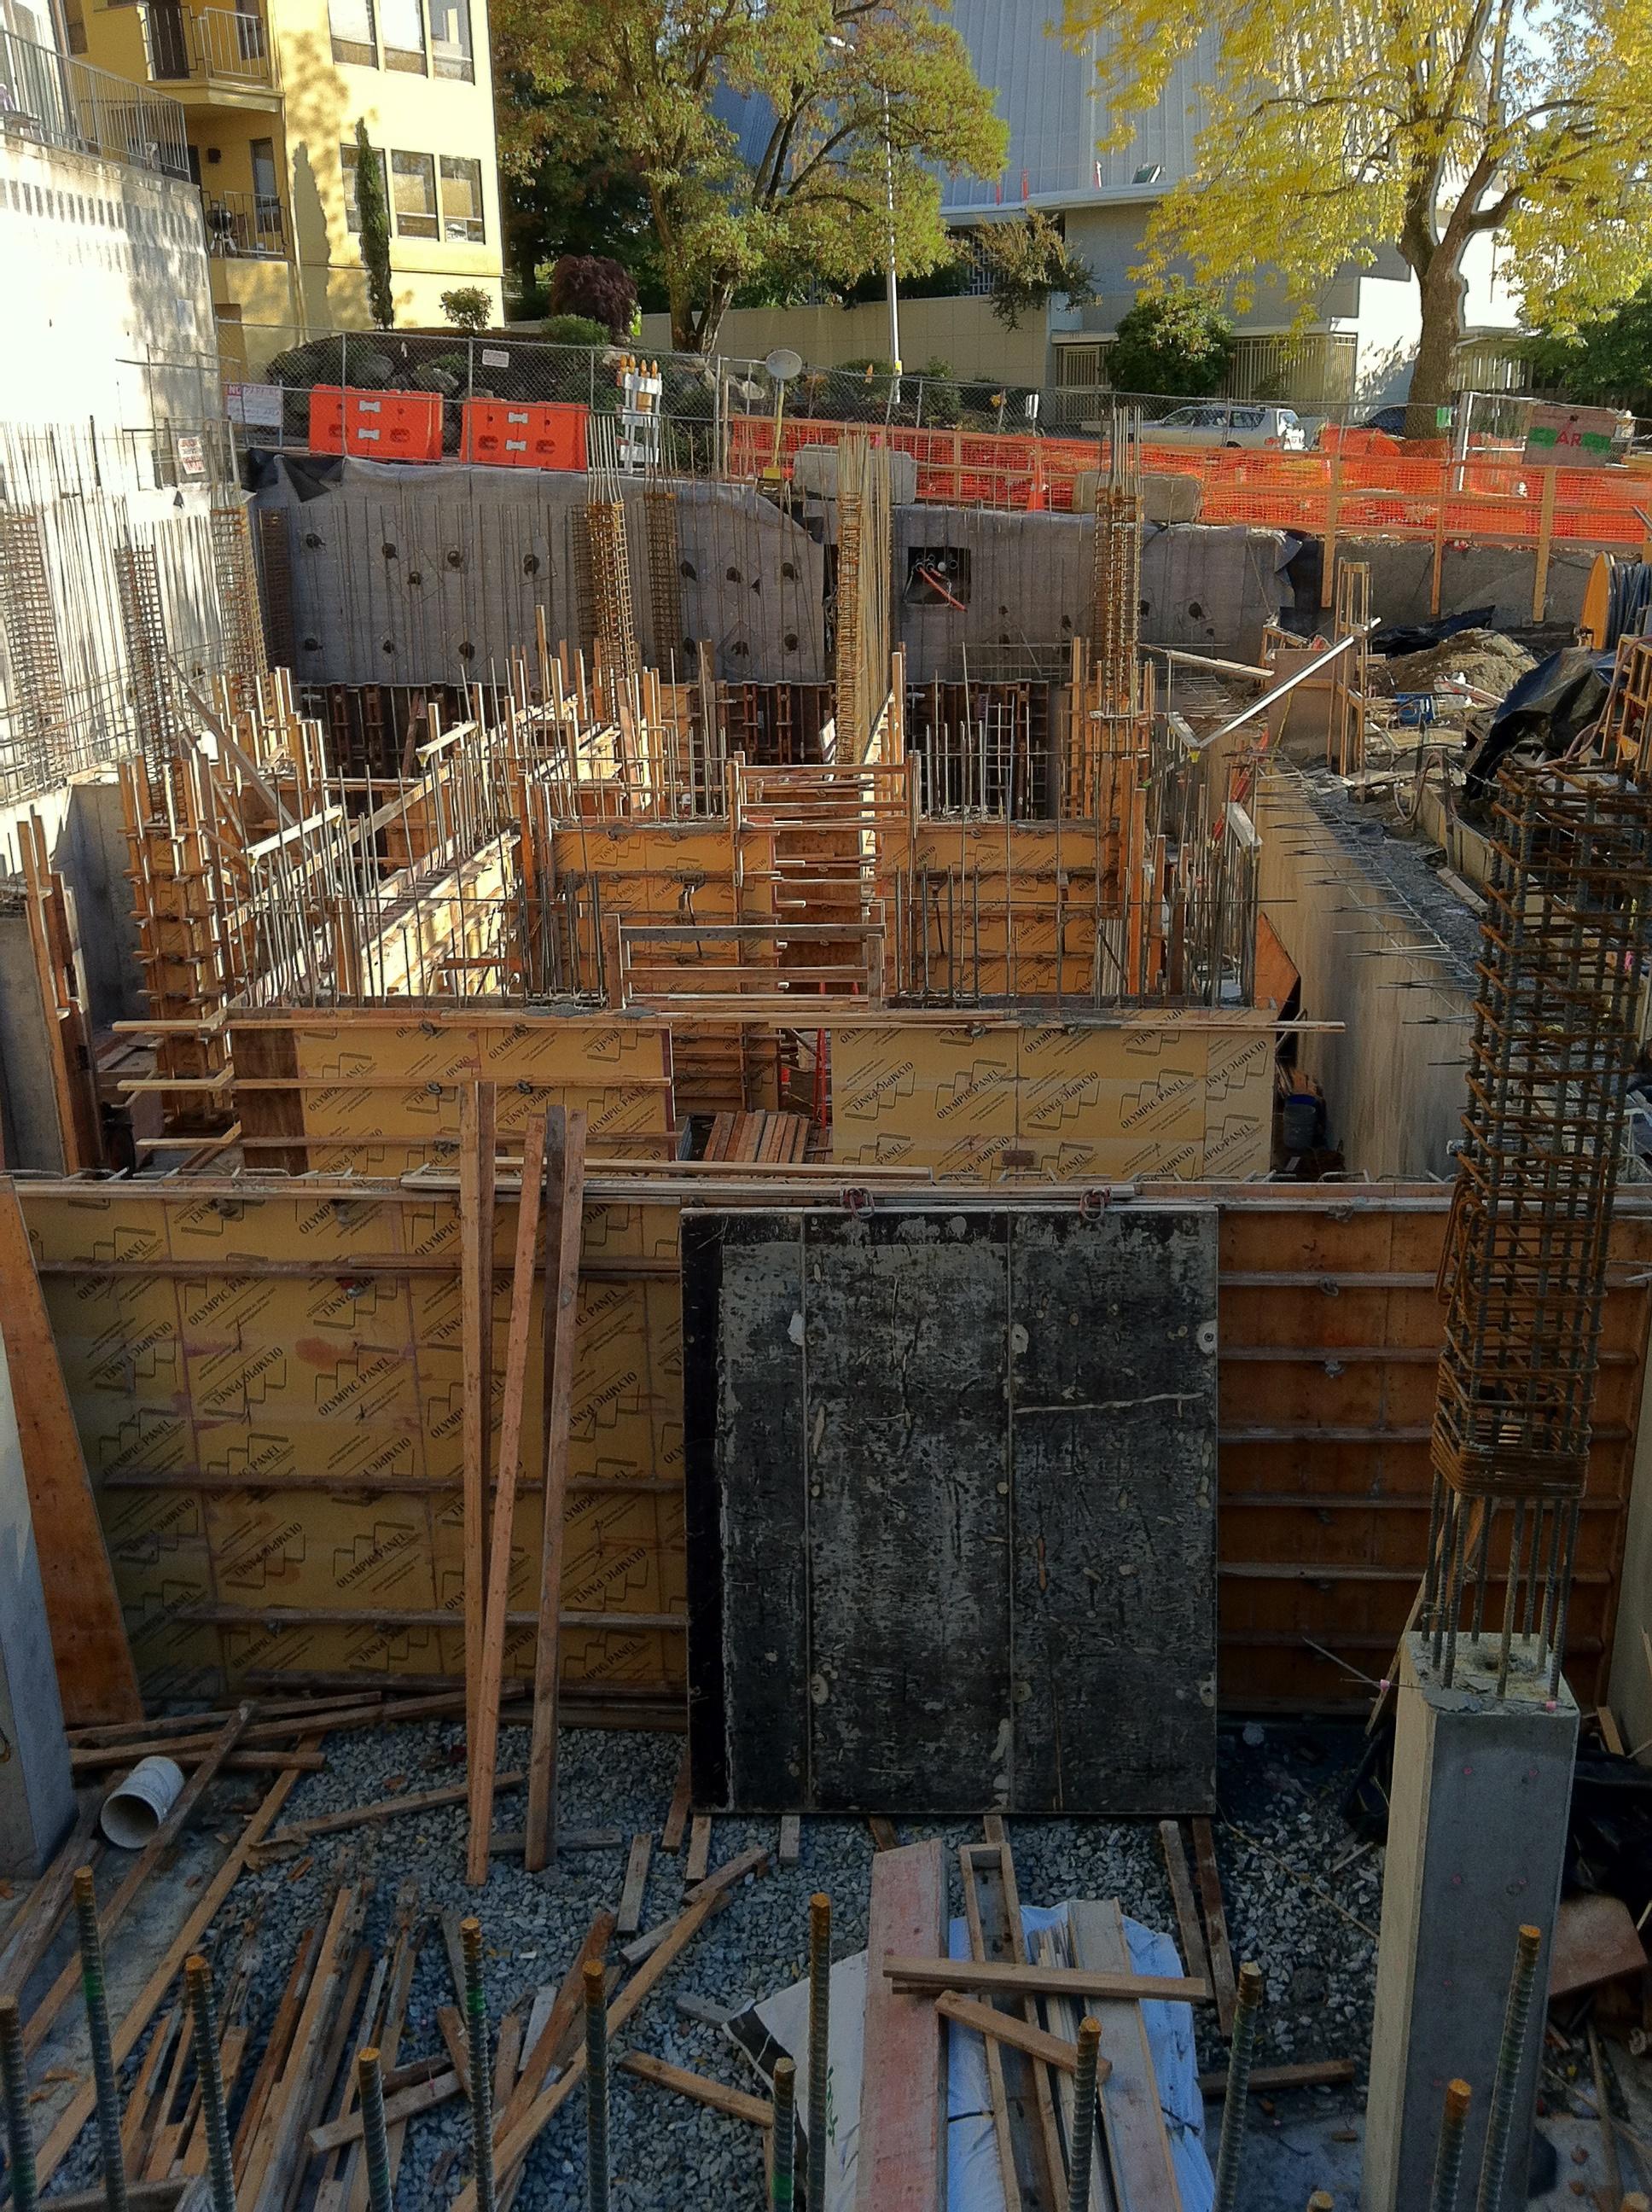 25 30 Seattle: File:Bullitt Center, Seattle Under Construction October 25